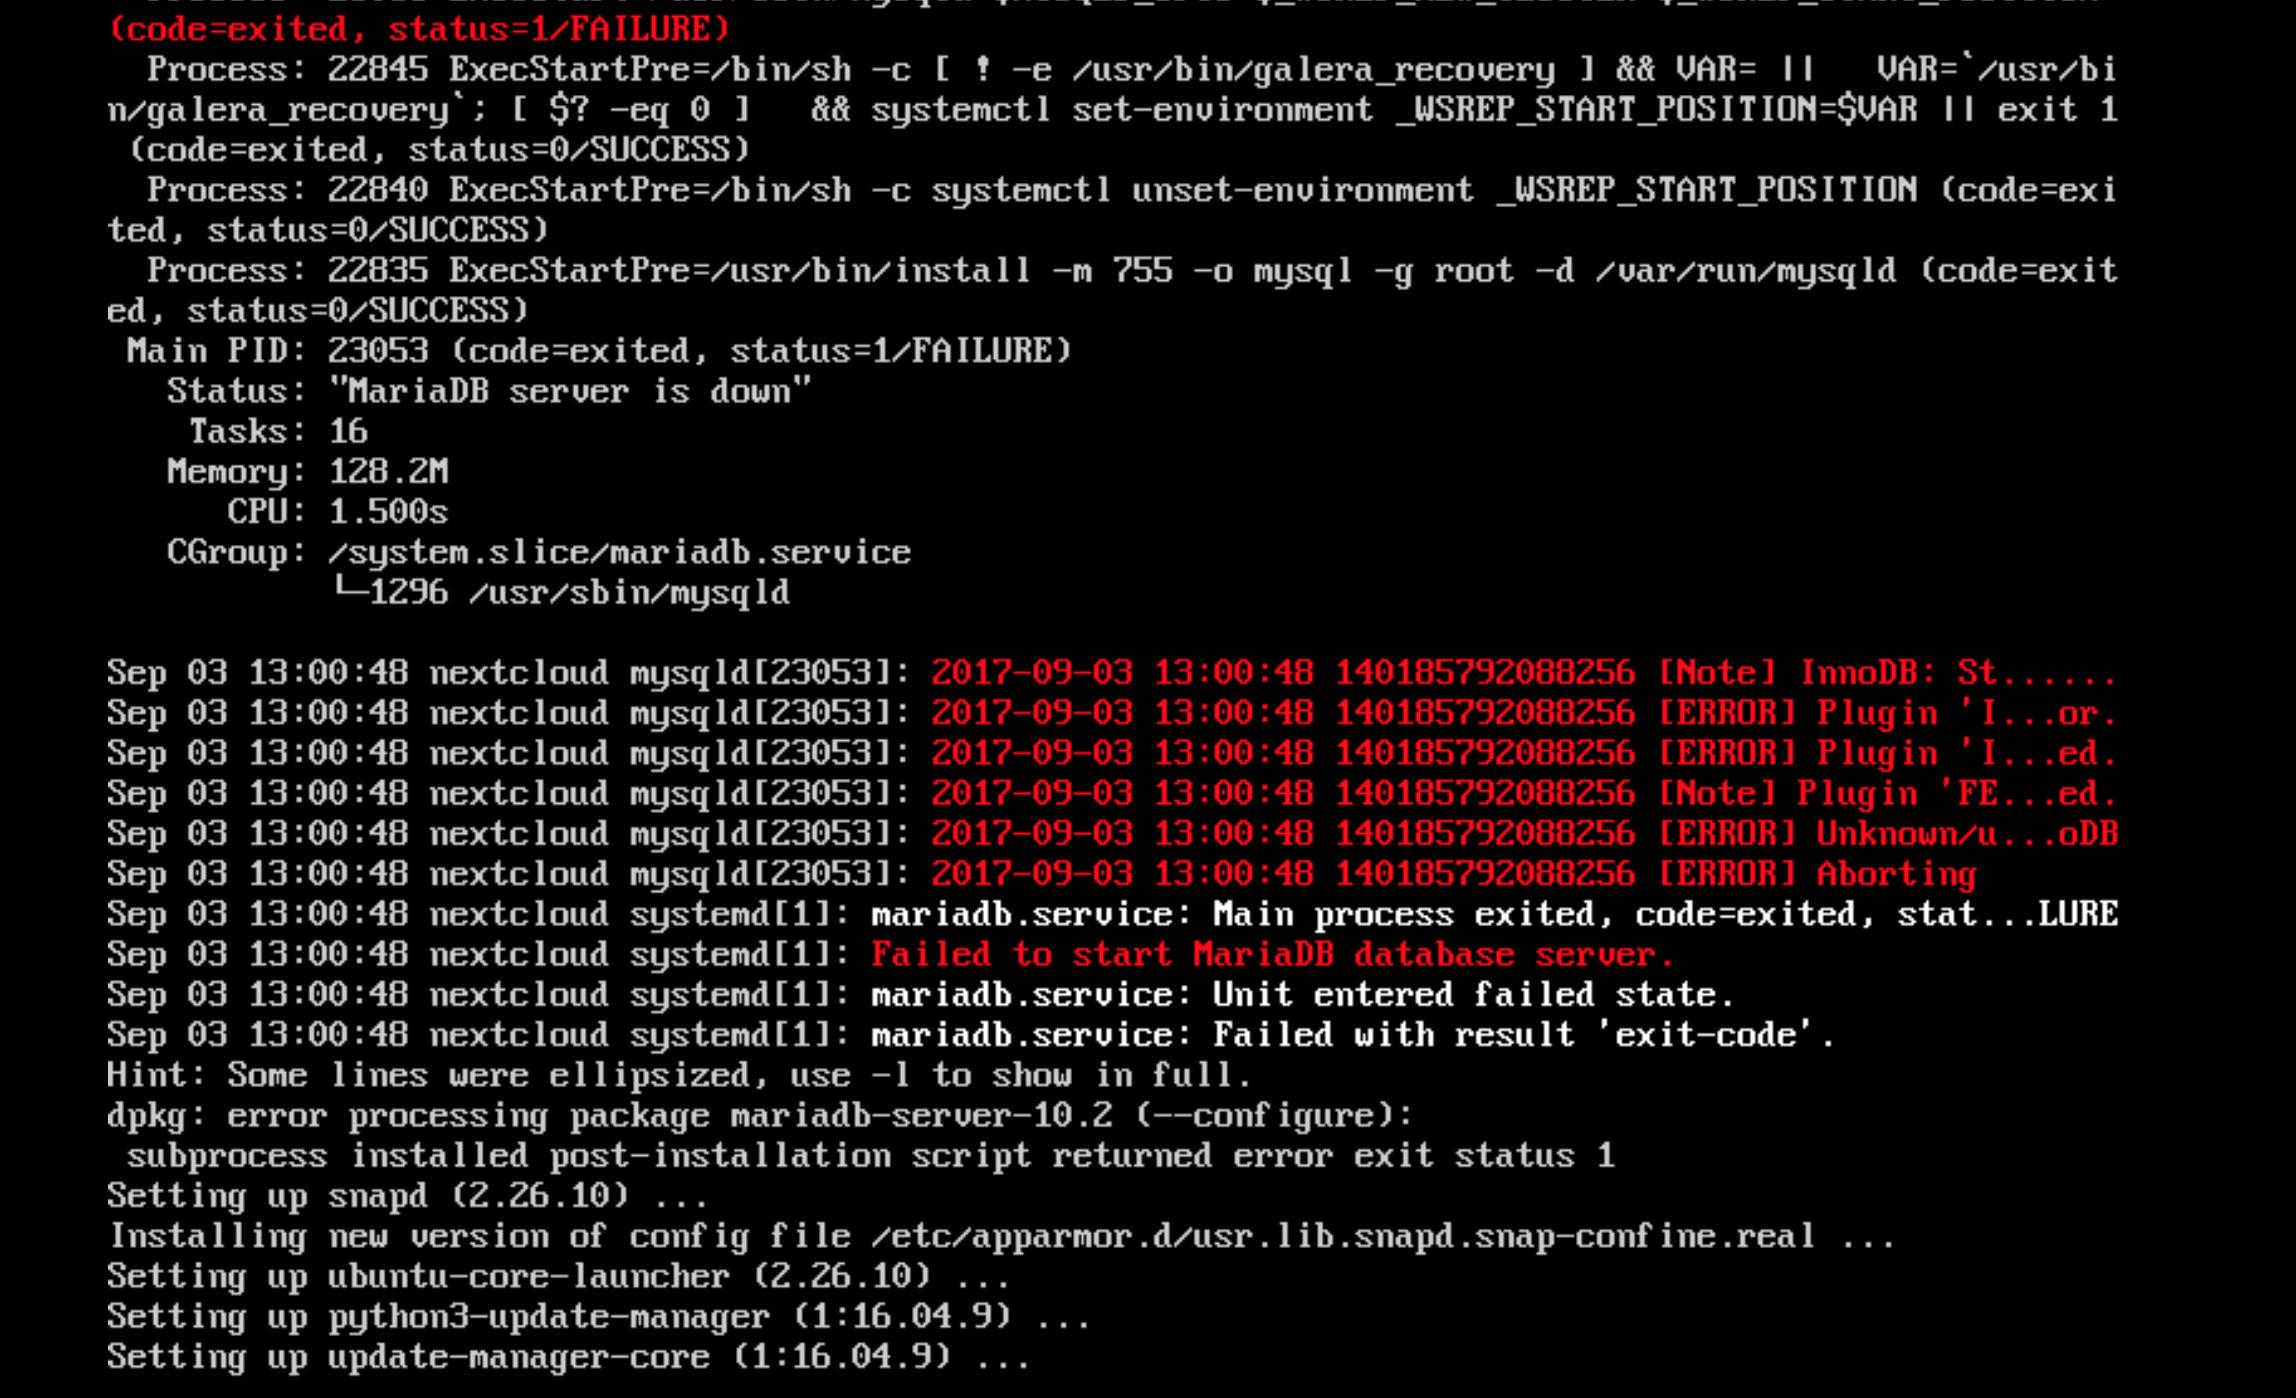 MariaDB fails to start when updated · Issue #362 · nextcloud/vm · GitHub